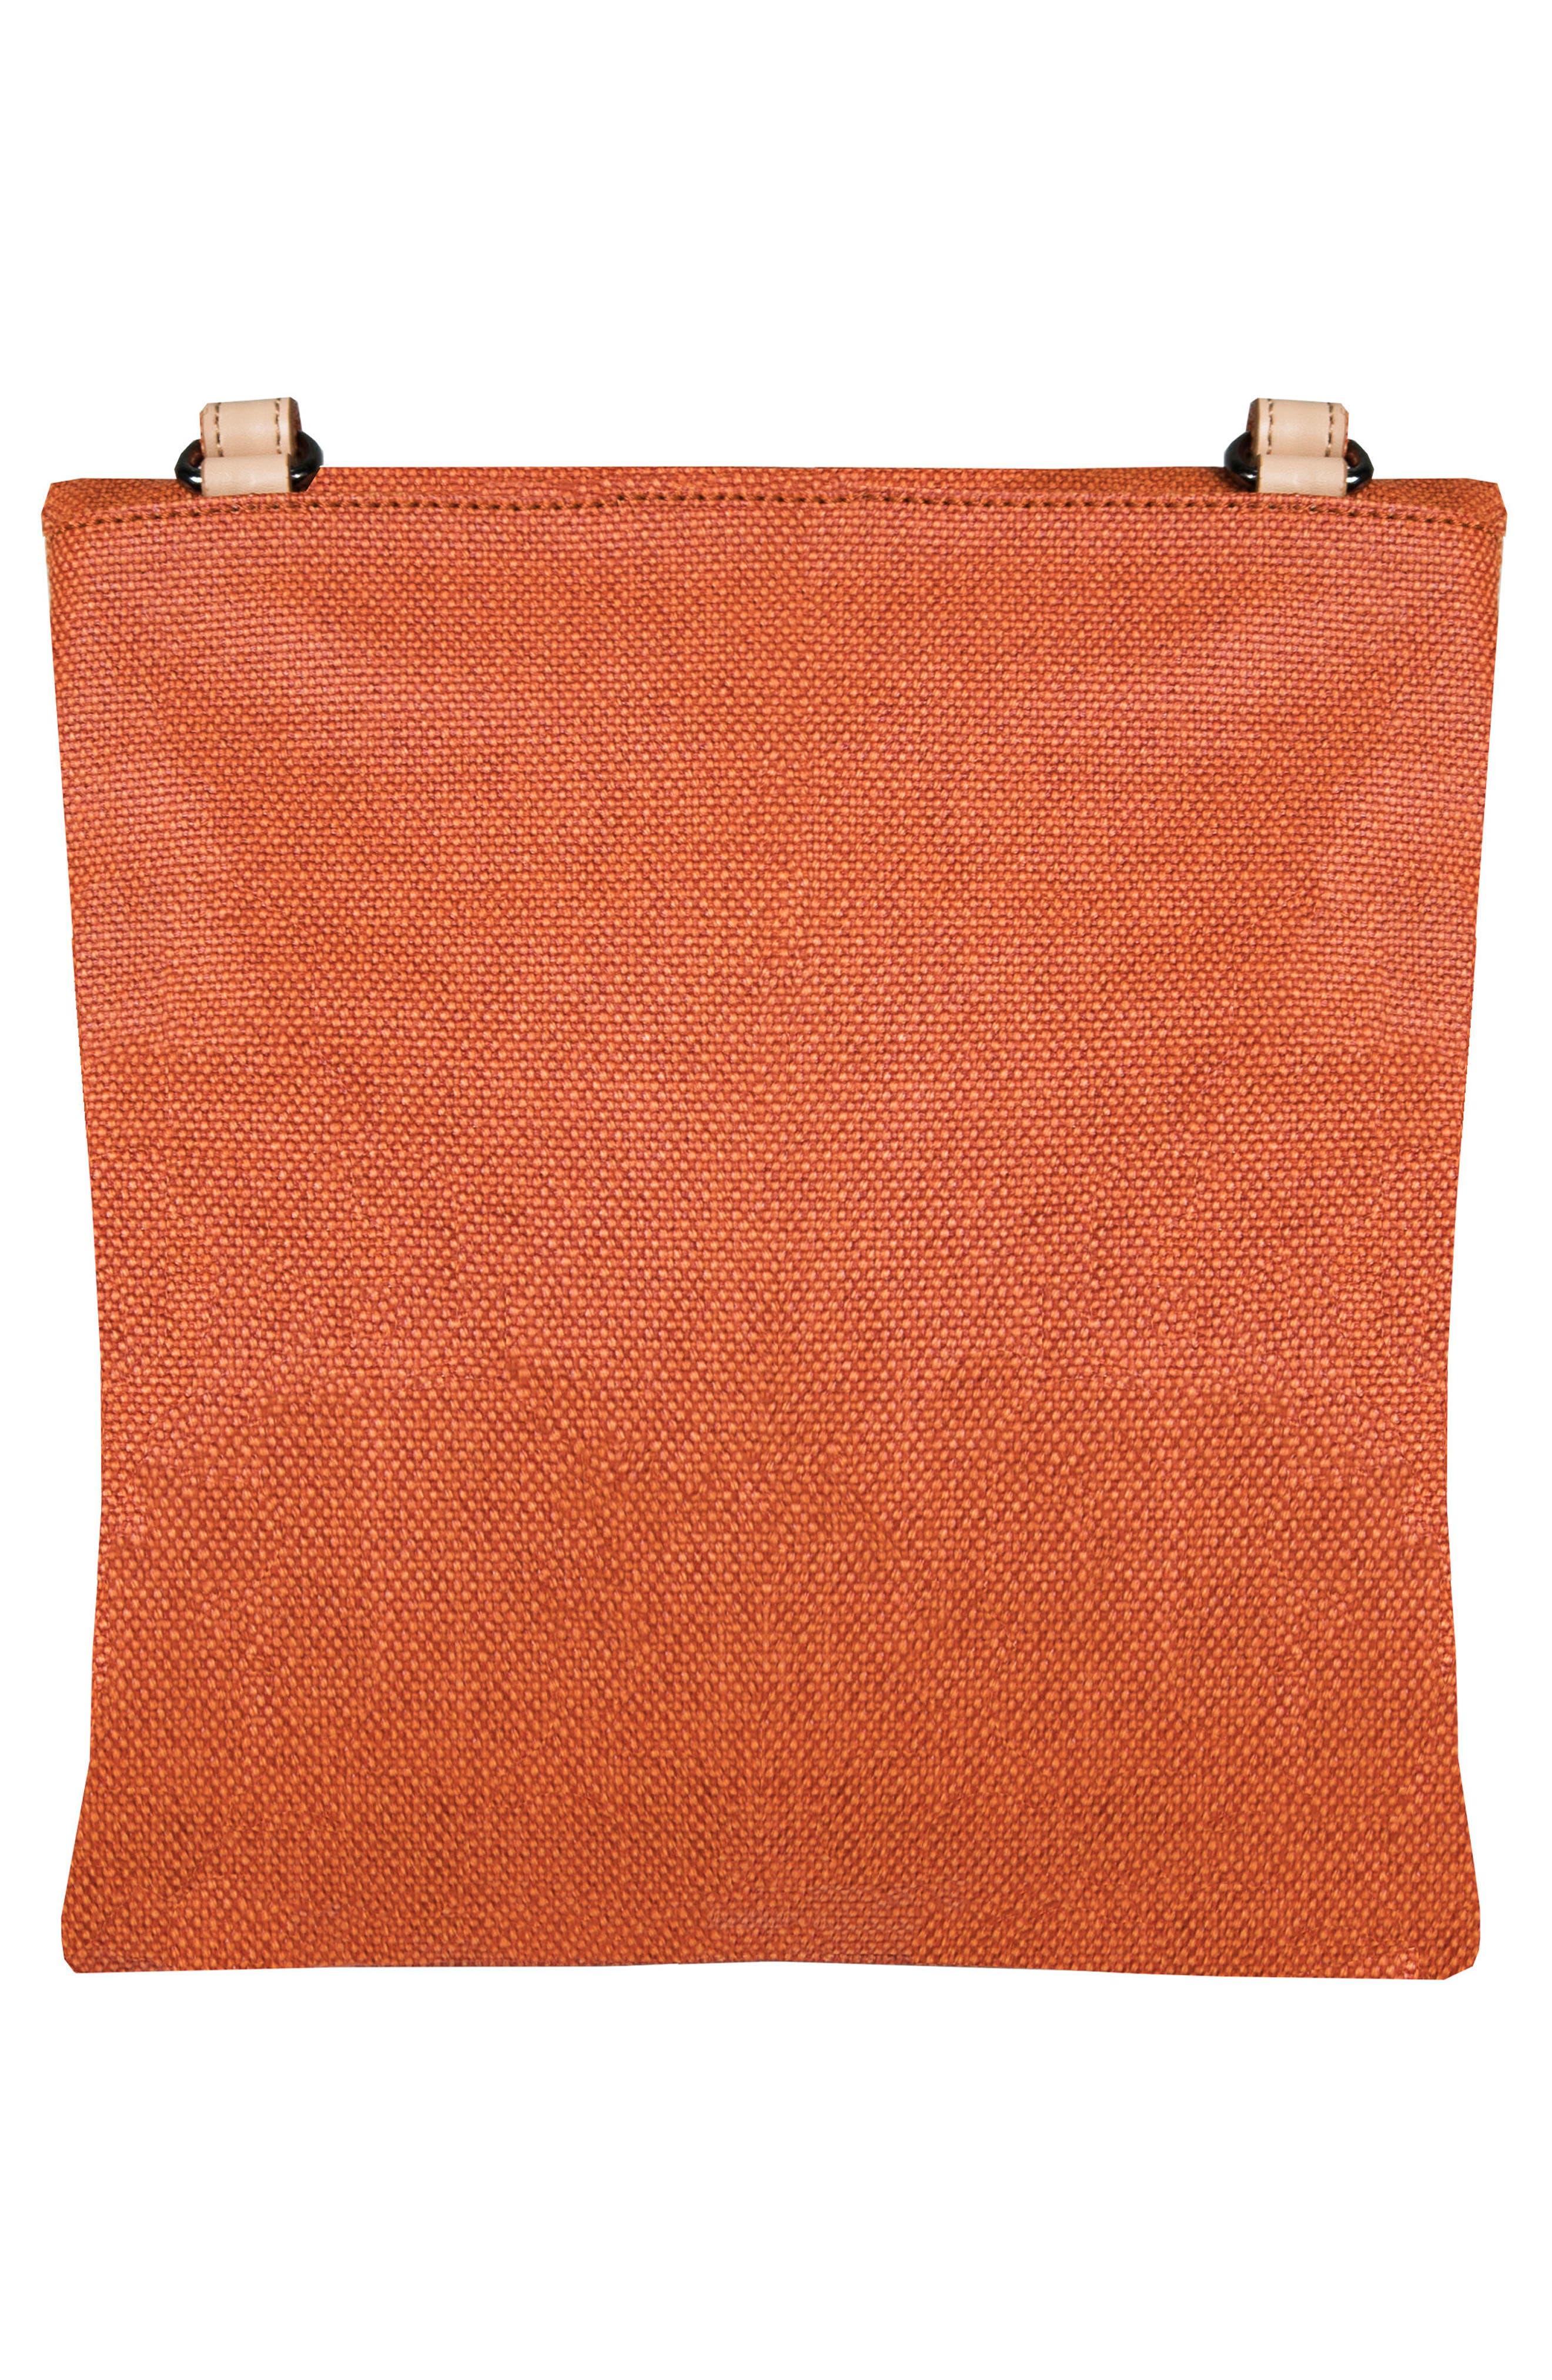 Rebel Coated Canvas Crossbody Bag,                             Alternate thumbnail 3, color,                             Copper